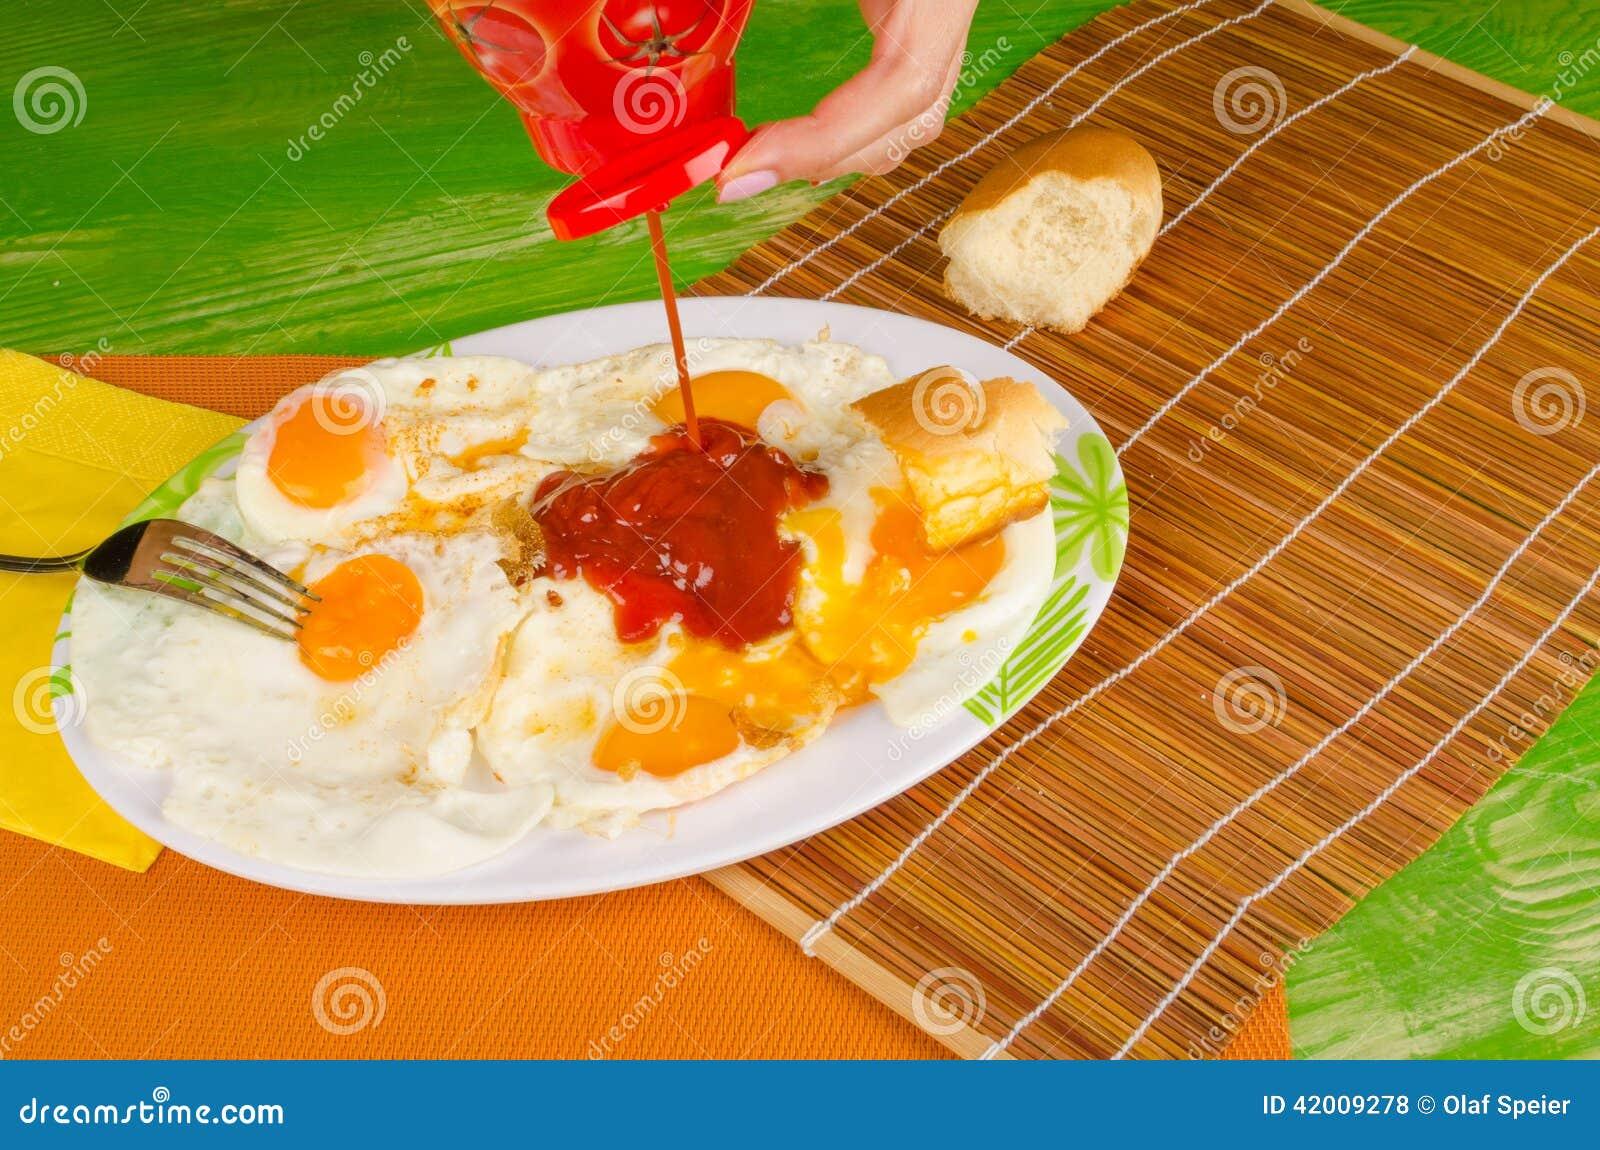 Ketchup On Eggs Stock Photo - Image: 42009278